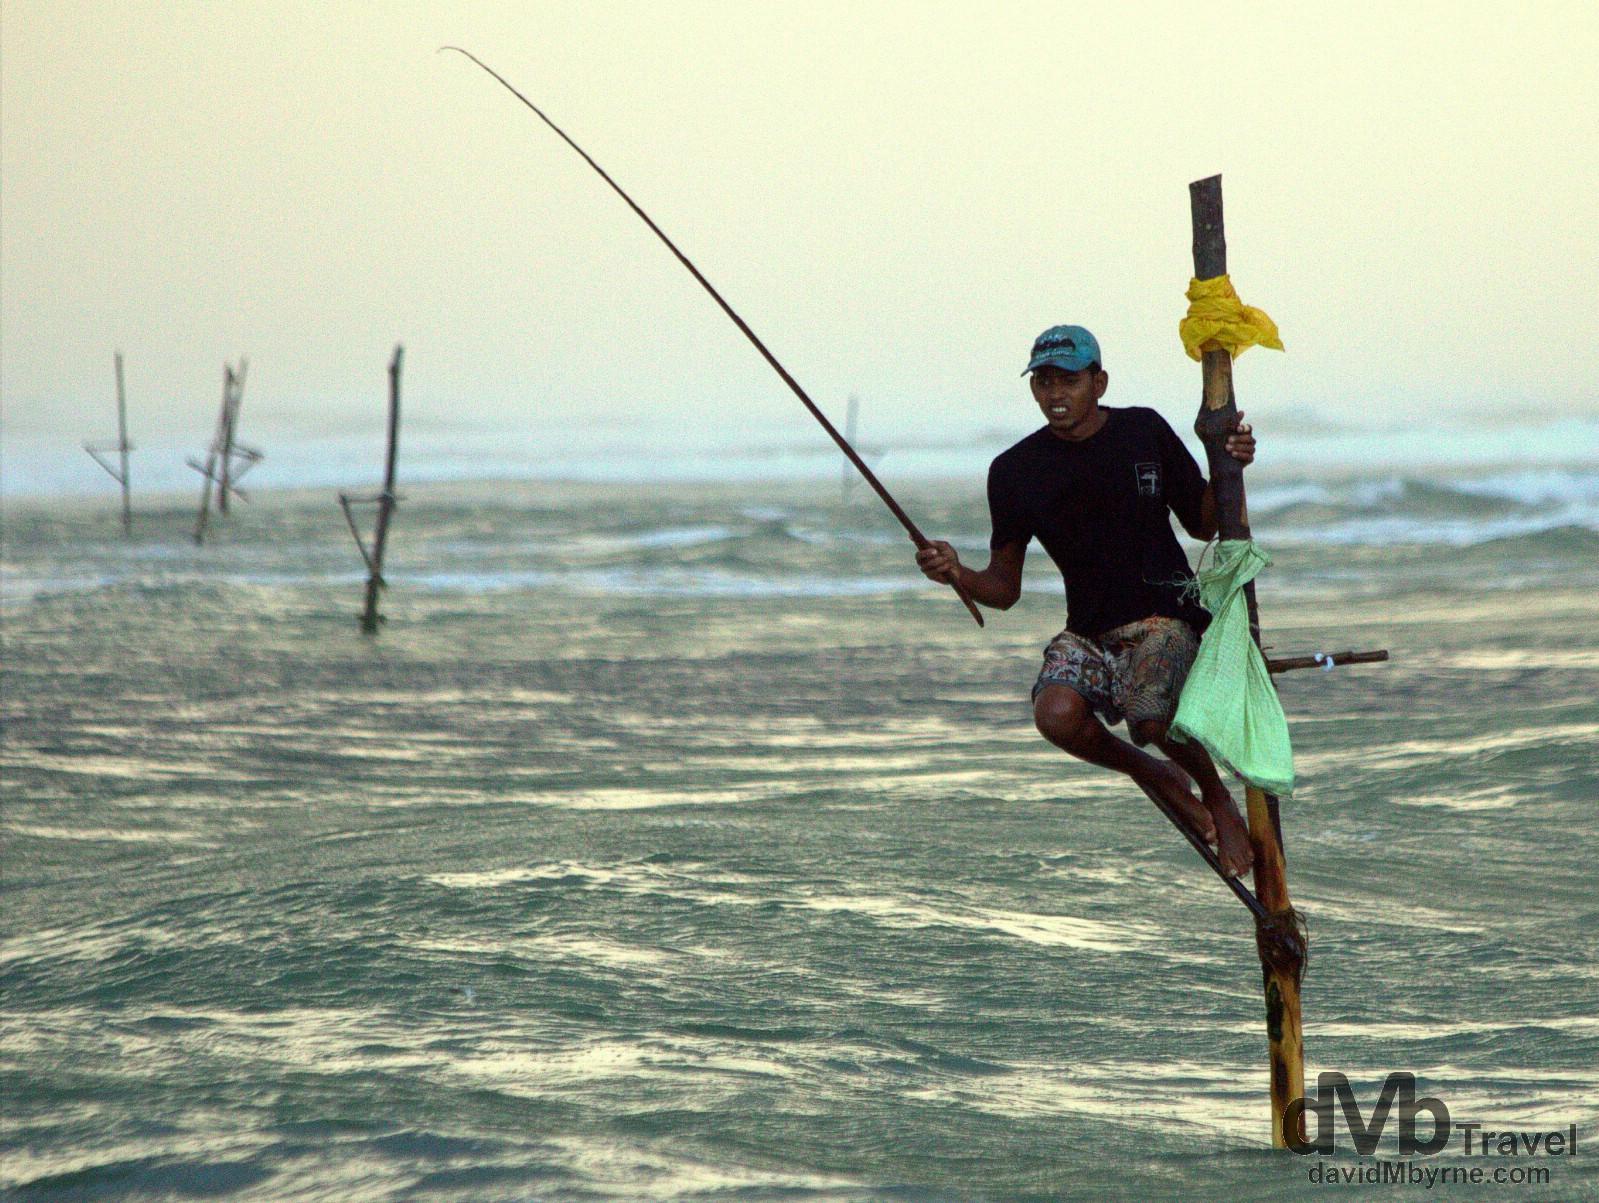 A stilt fisherman plying his craft outside the village of Koggala, southern Sri Lanka. September 2nd 2012.